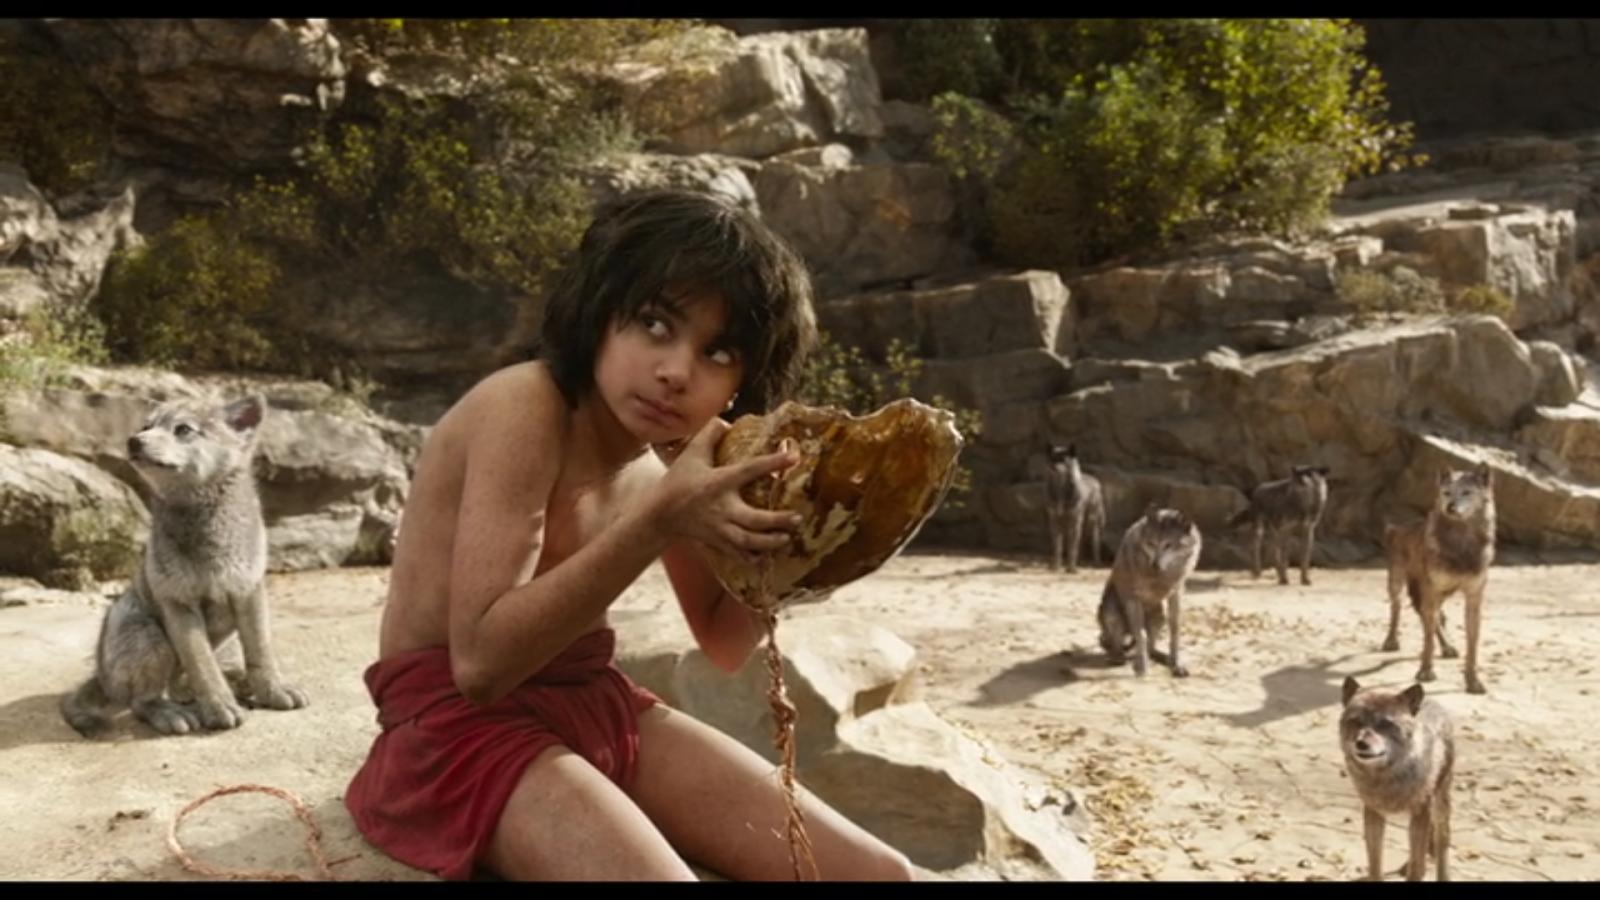 Aom Movies Et Al The Jungle Book 2016